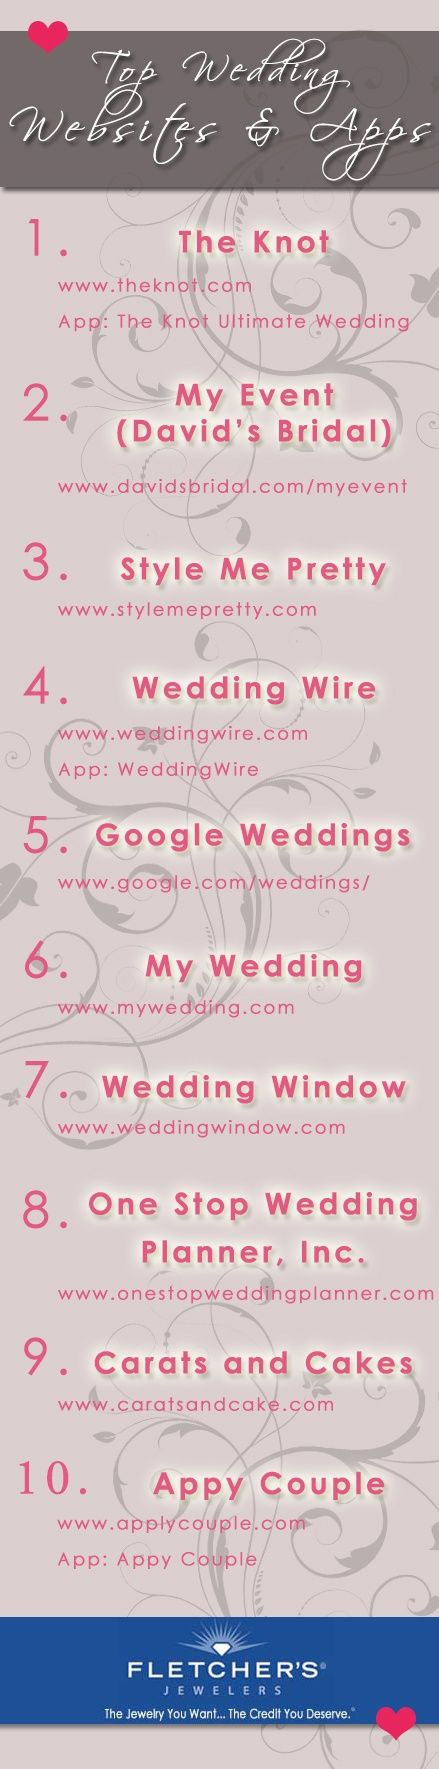 #WEDDING #WEDDING #WEDDING  Wedding Websites